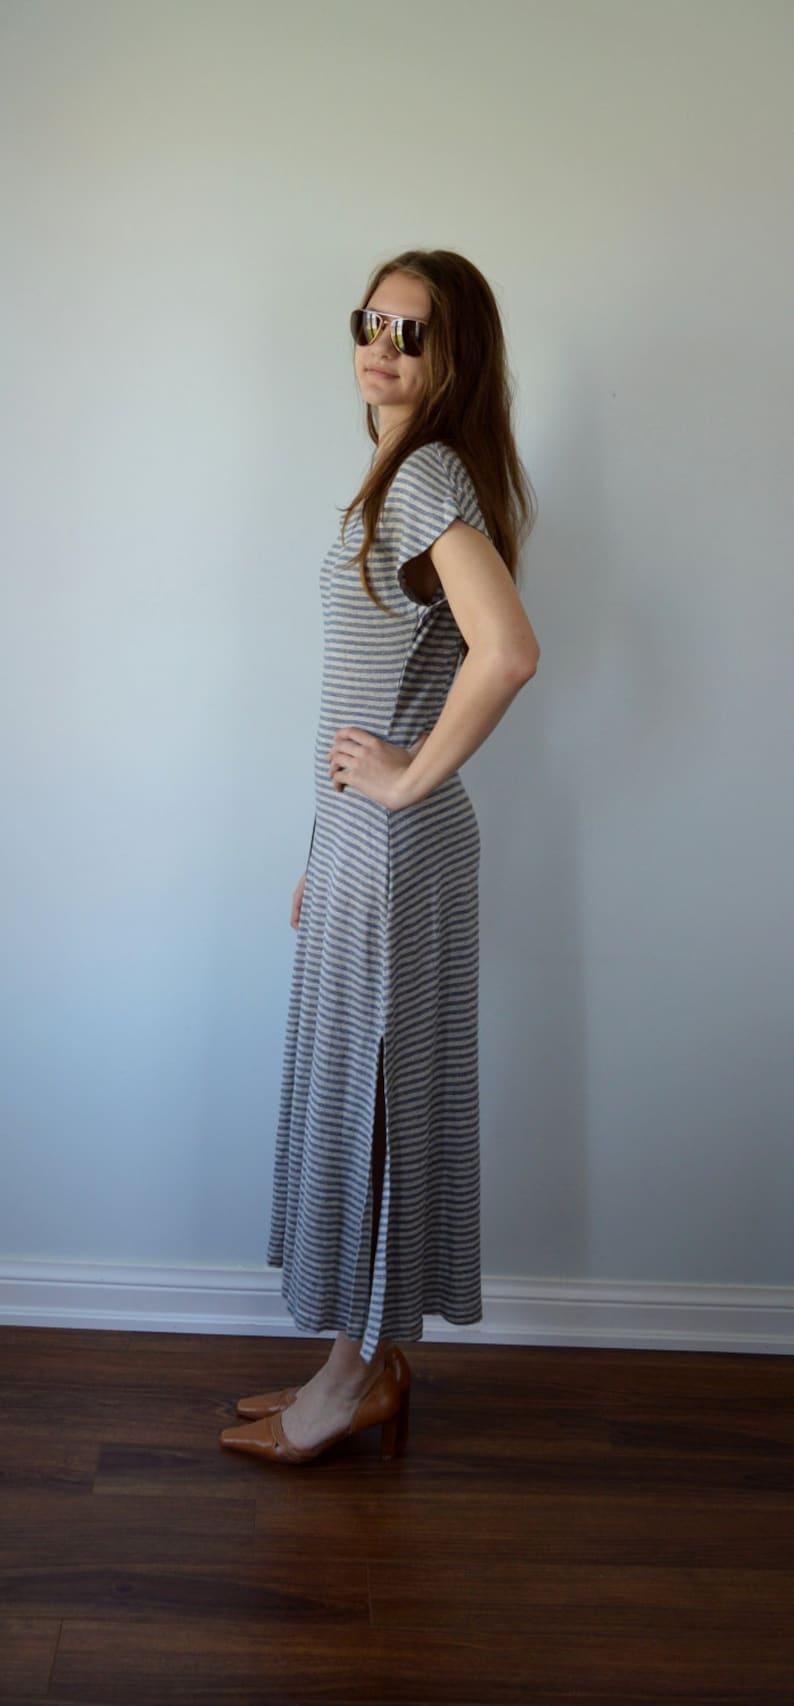 Summer Dress Denim Blue and Grey Horizontal Stiped Knit Dress The Limited Casual Dress Street Wear 1990s Dress Maxi Dress